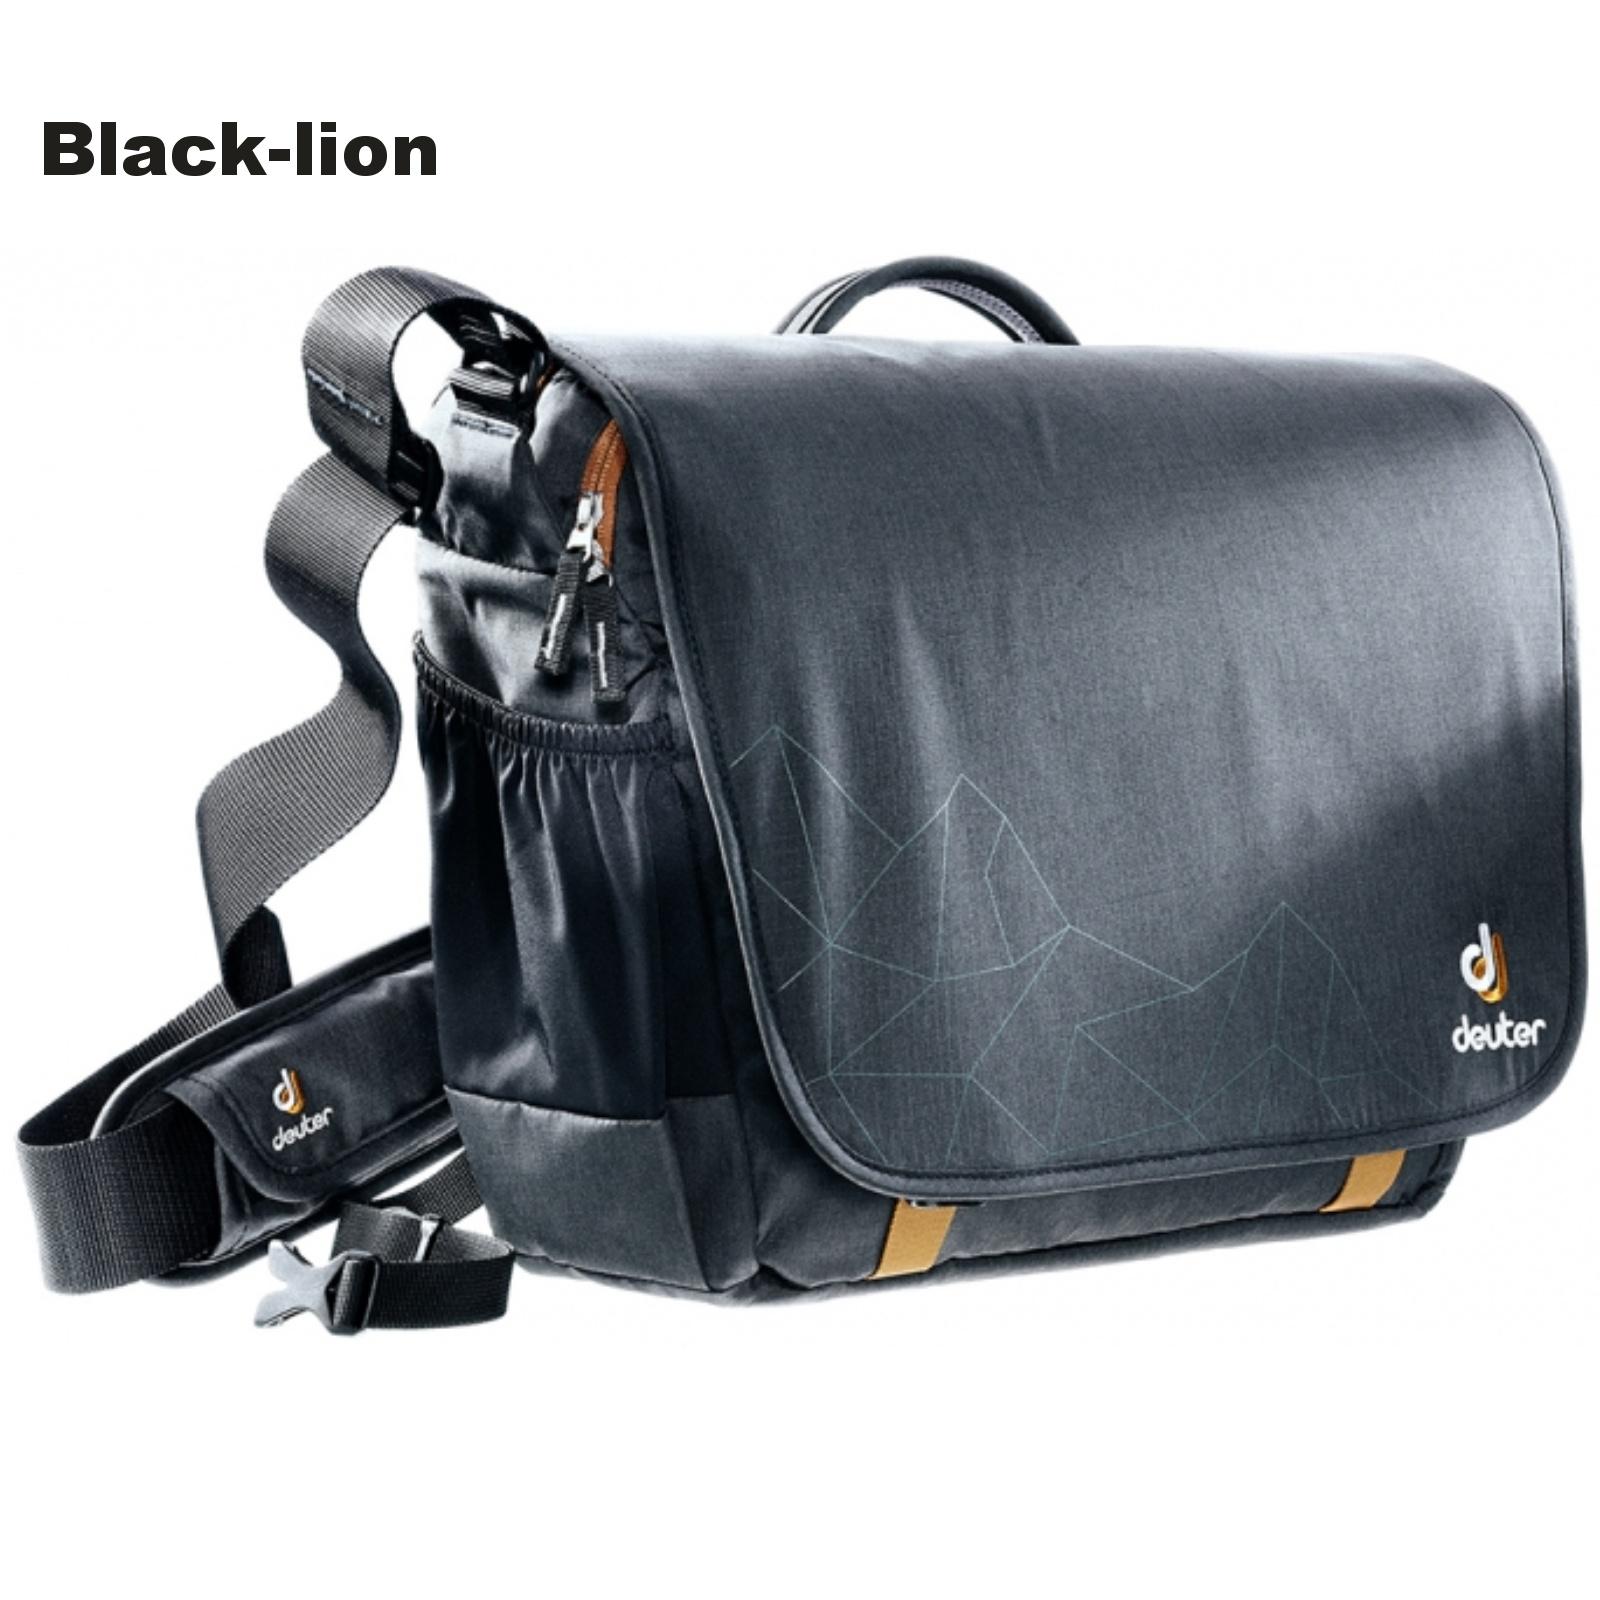 Taška přes rameno DEUTER Operate II - black-lion